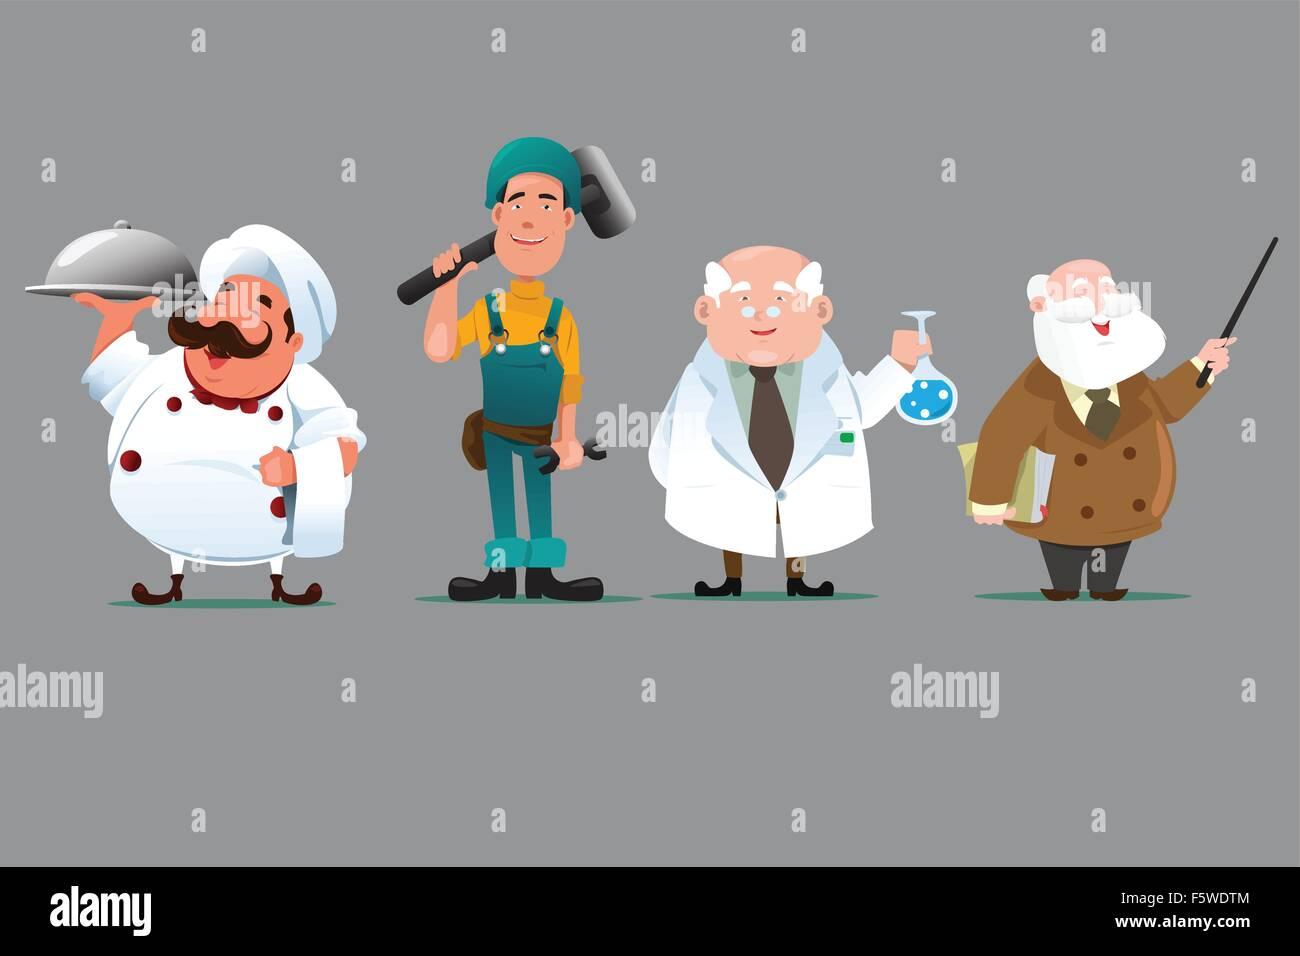 A vector illustration of a chef, builder, chemist and teacher - Stock Vector